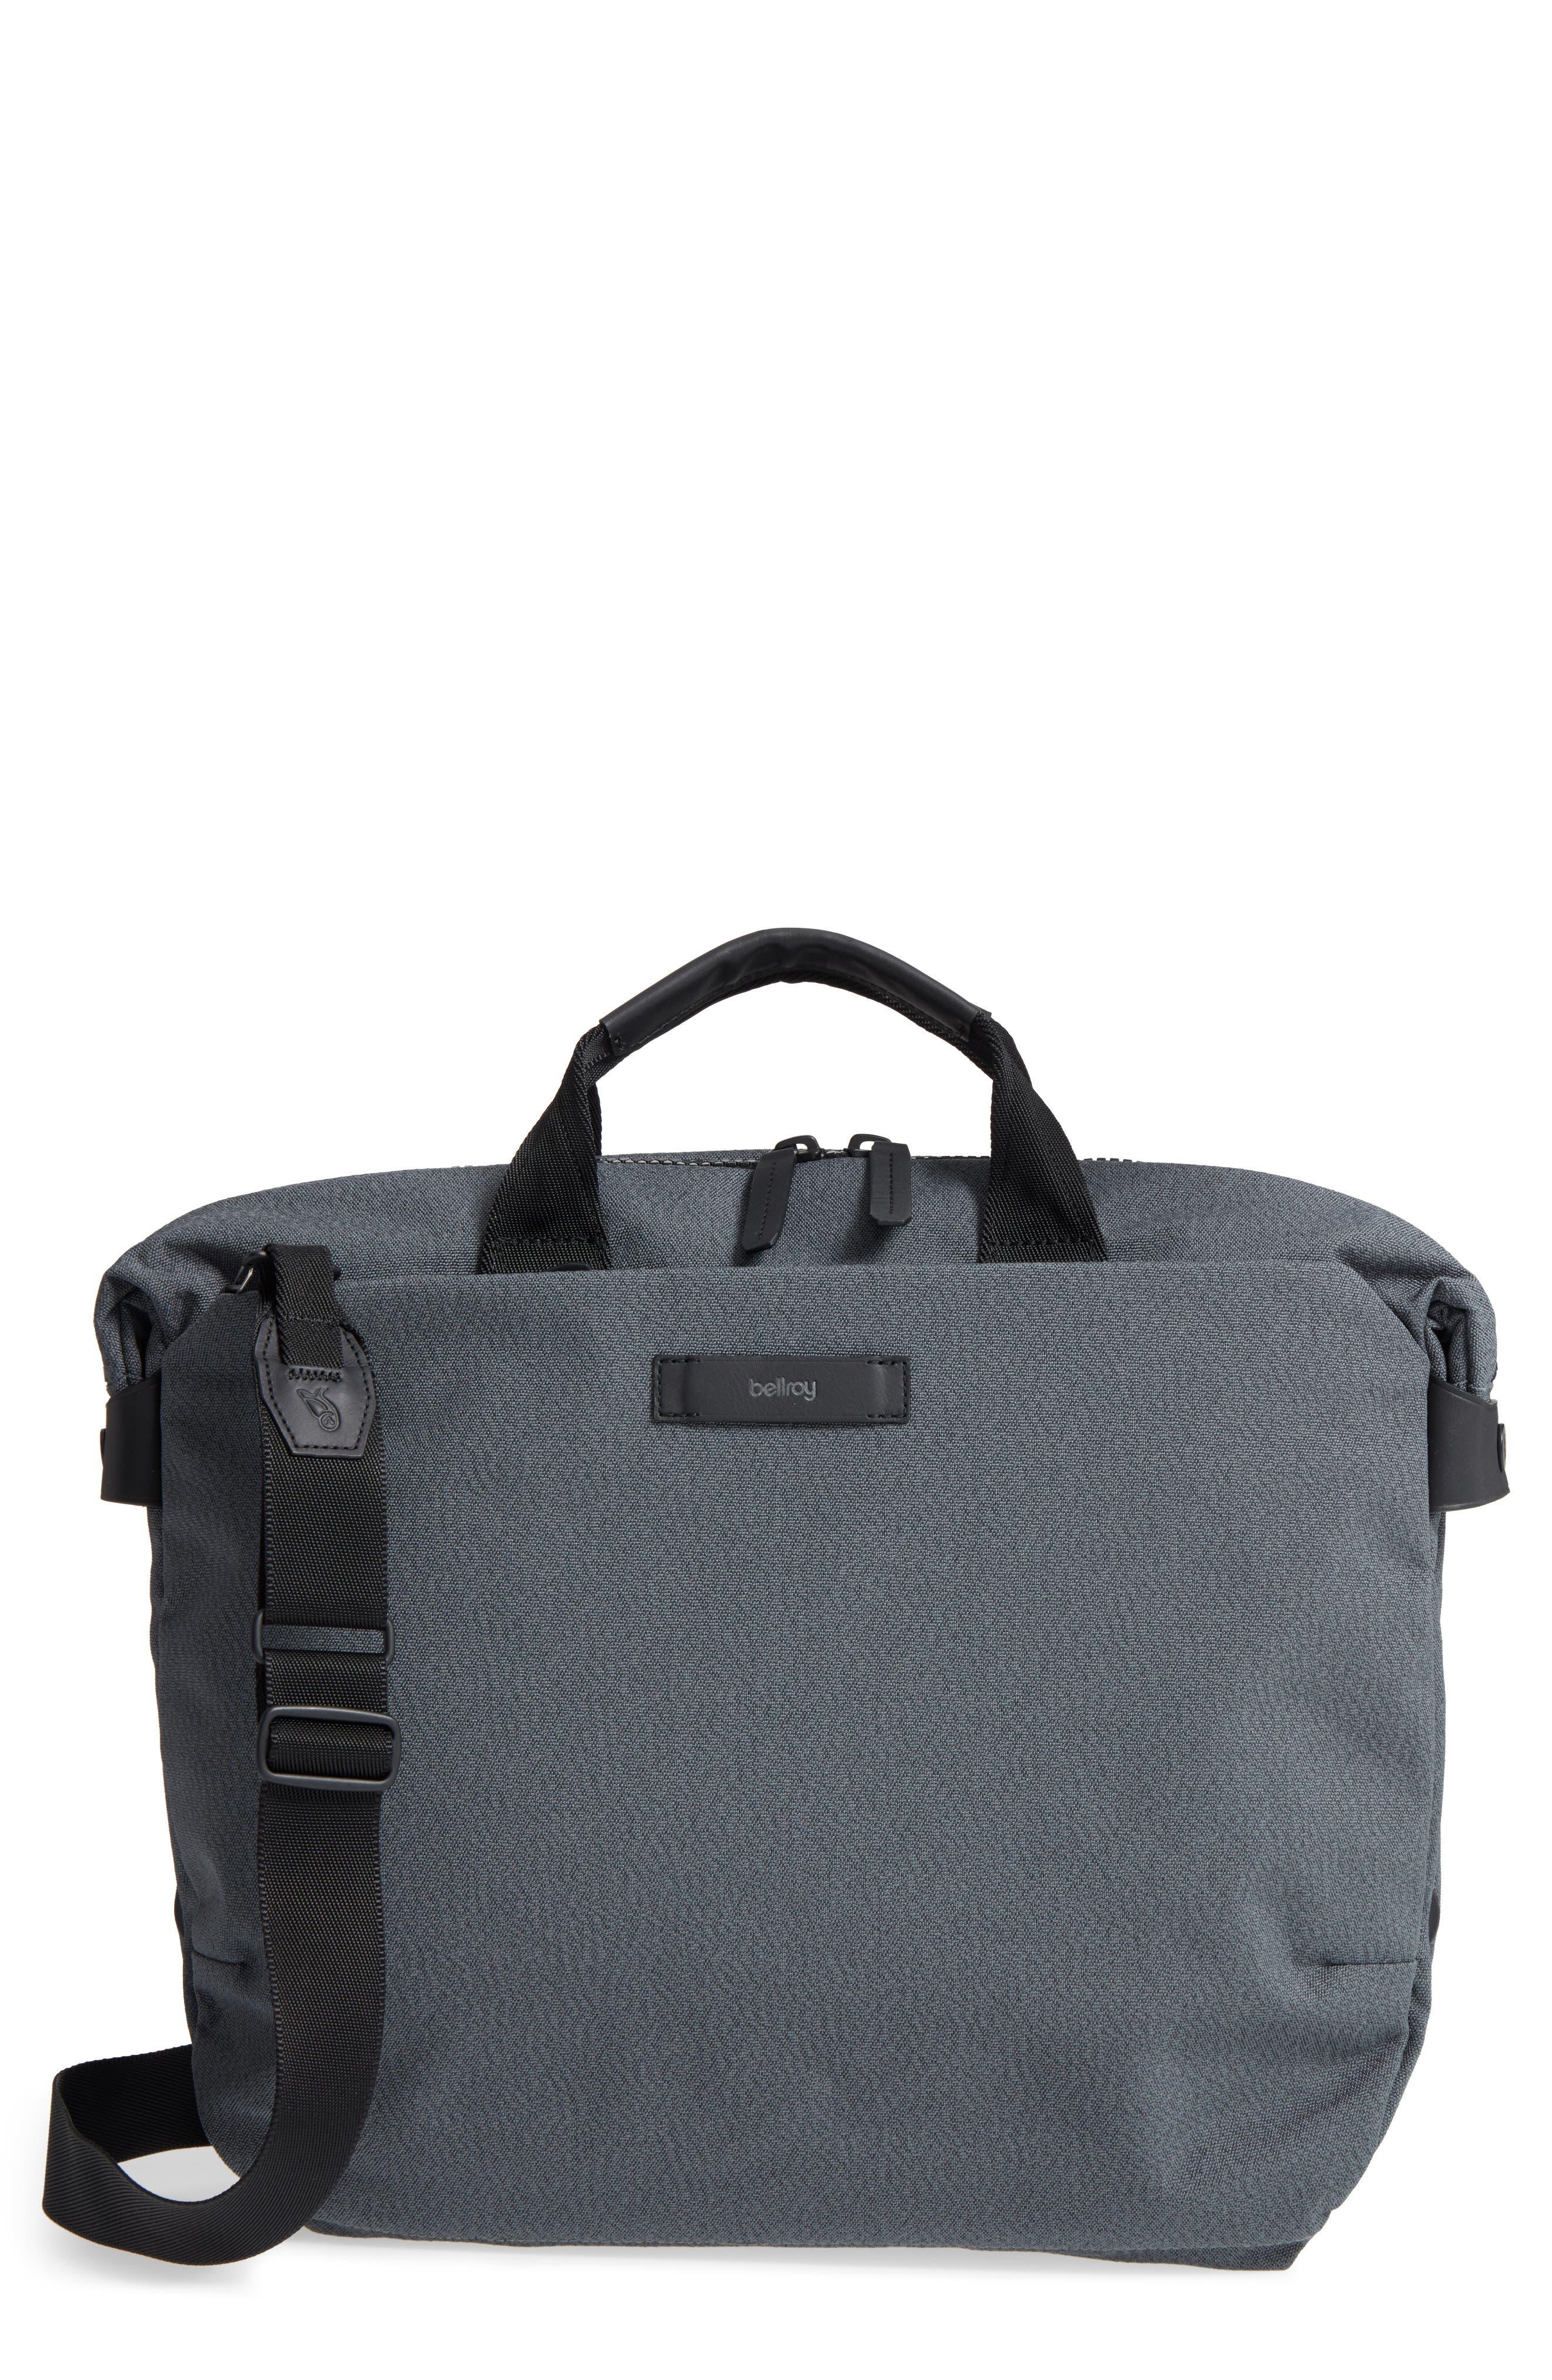 Main Image - Bellroy Duo Briefcase